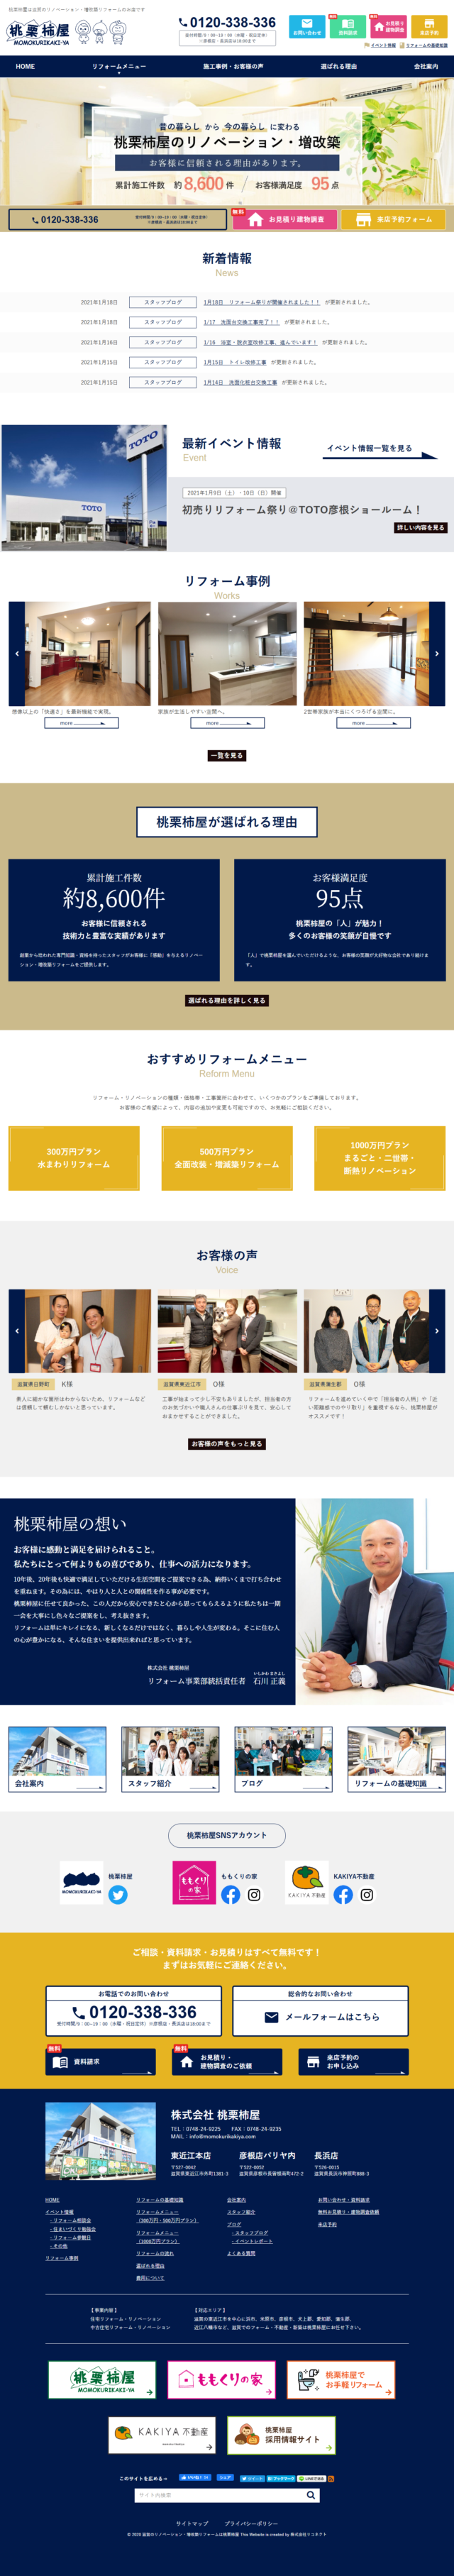 滋賀県東近江市 住宅リフォーム会社の株式会社 桃栗柿屋 様